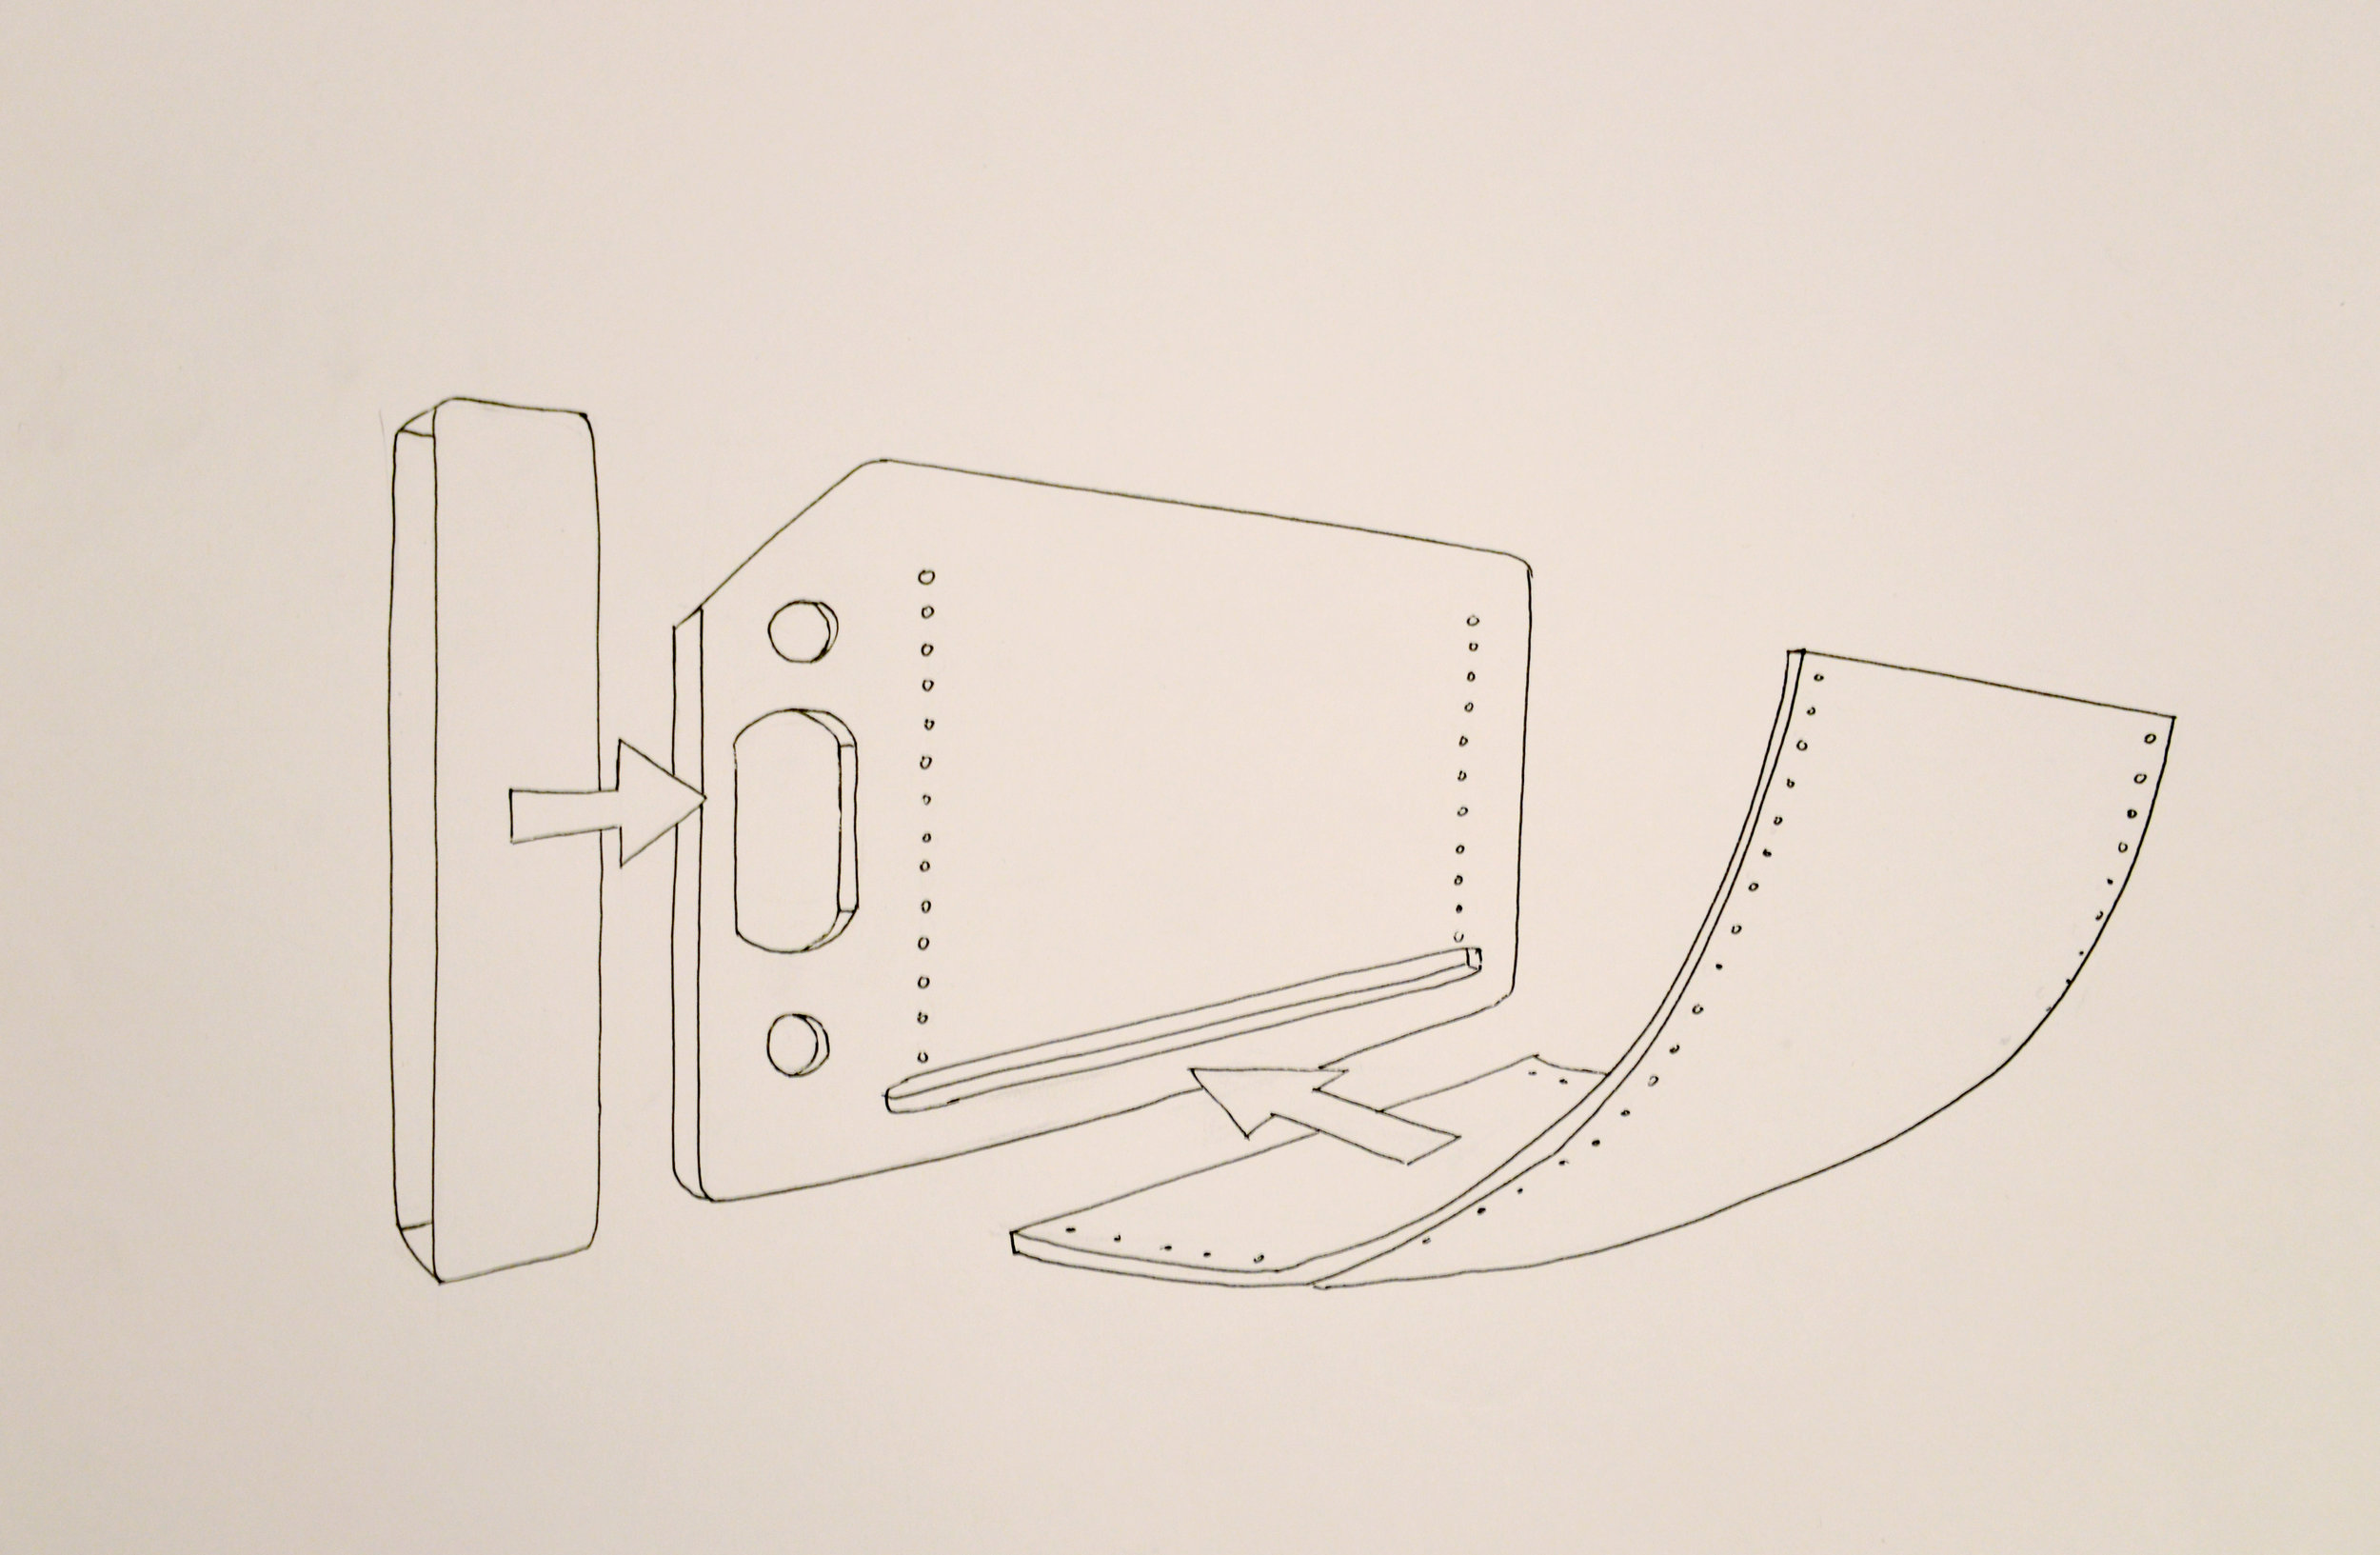 Lee, Megan Chosen Product Sketch